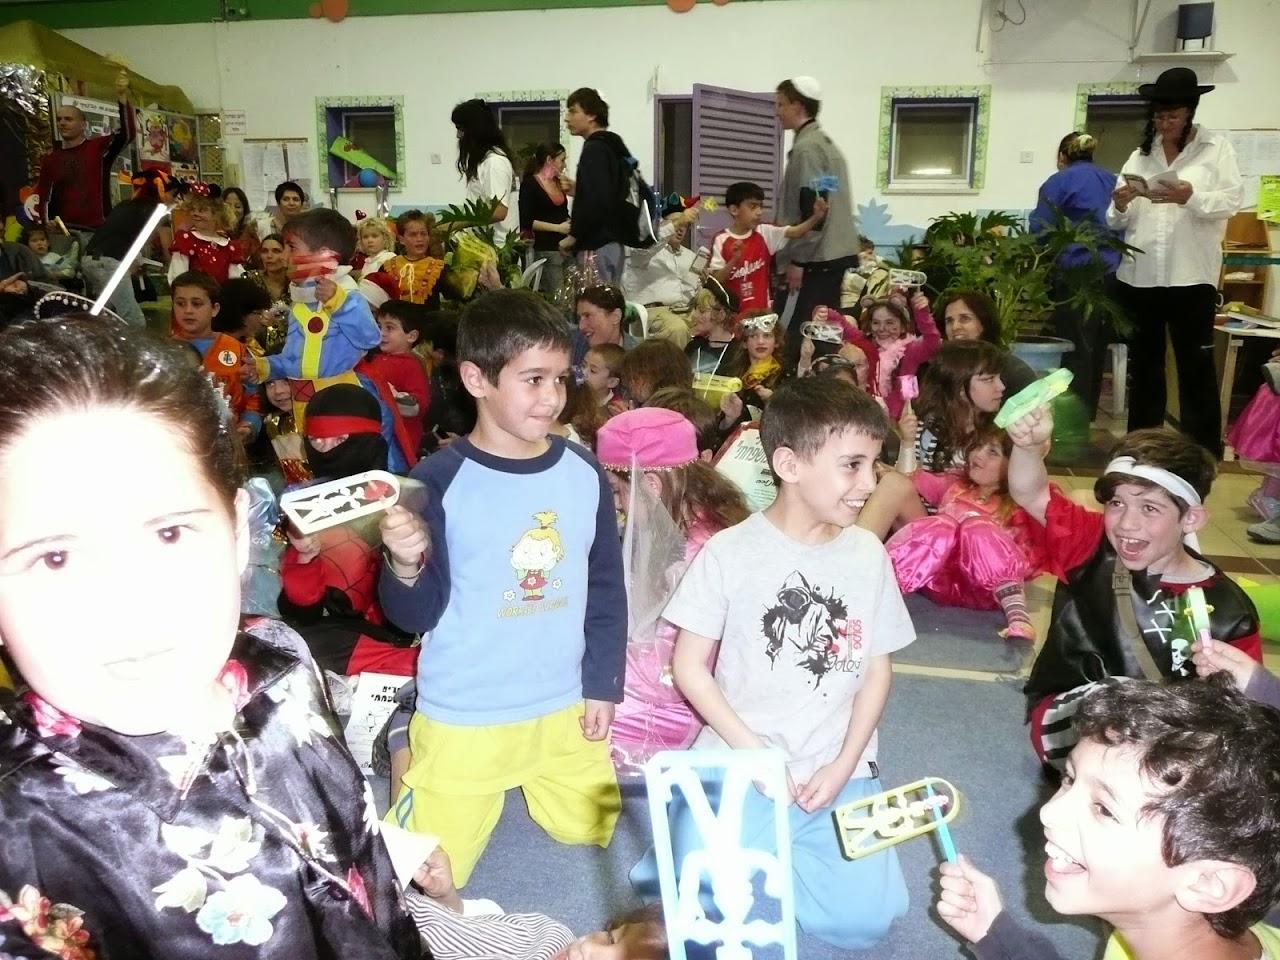 Purim 2008  - 2008-03-20 18.52.00.jpg